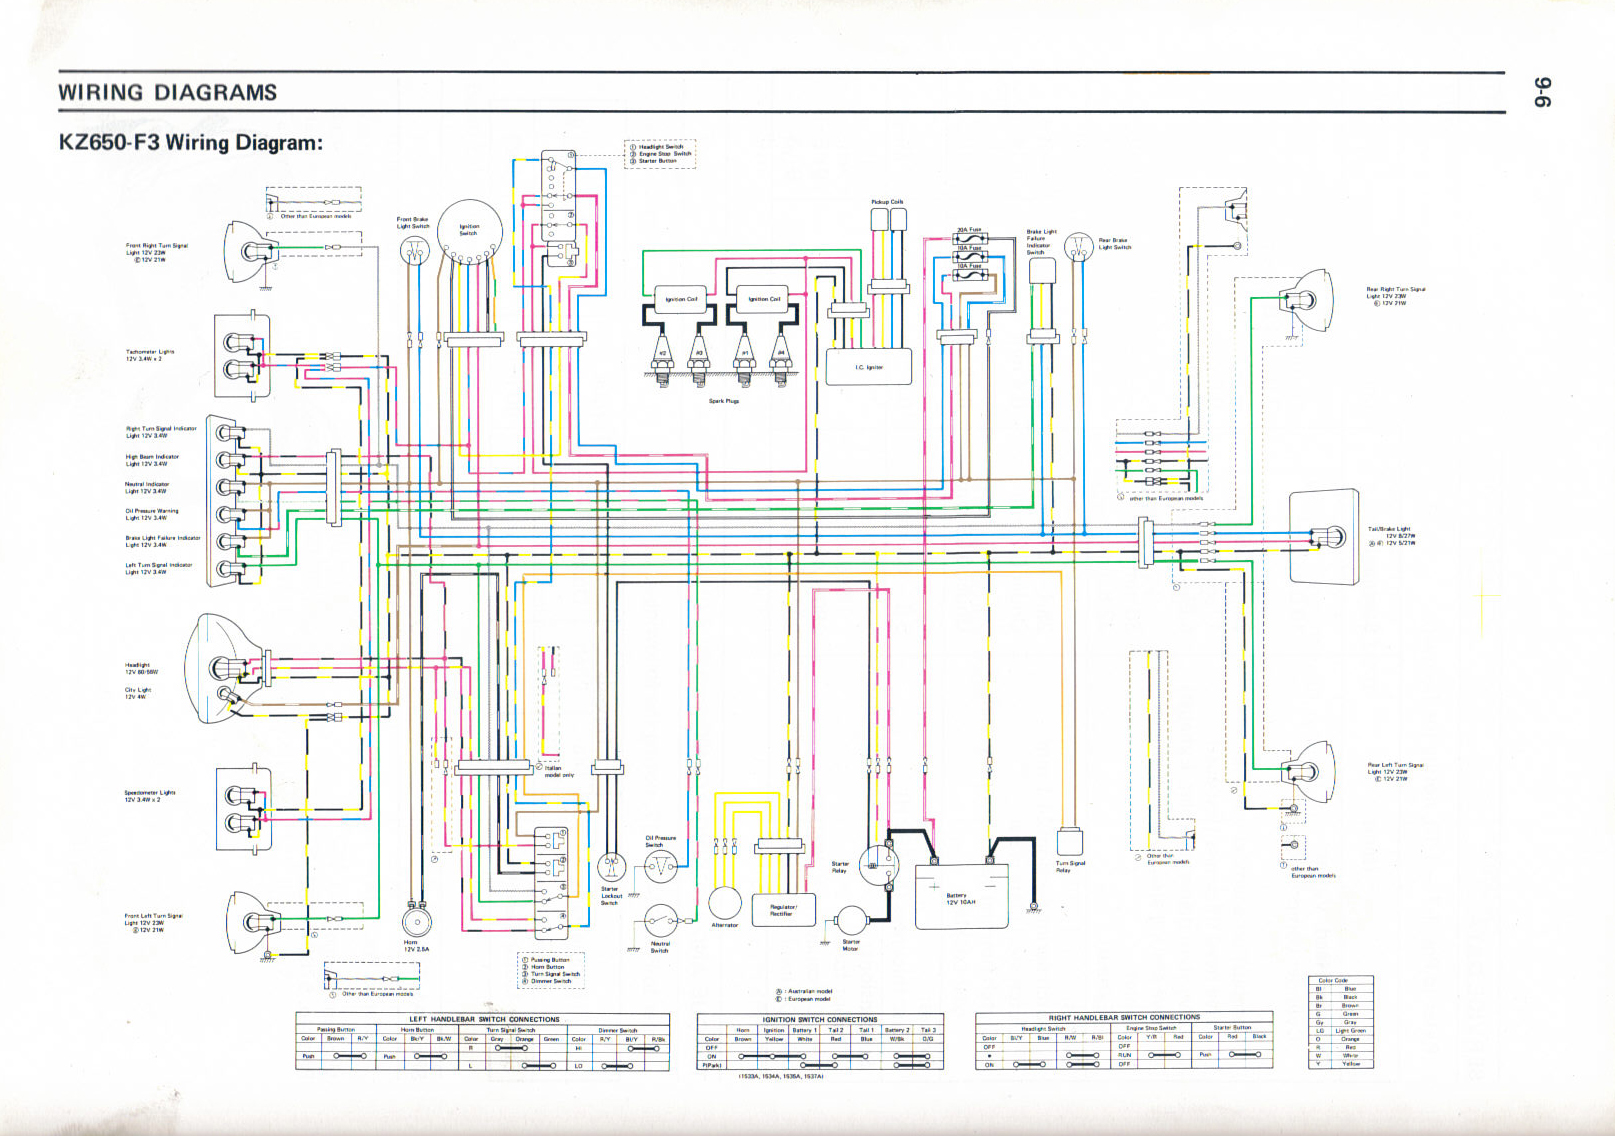 Tremendous E1 Wiring Diagram Wiring Diagram Wiring Cloud Uslyletkolfr09Org